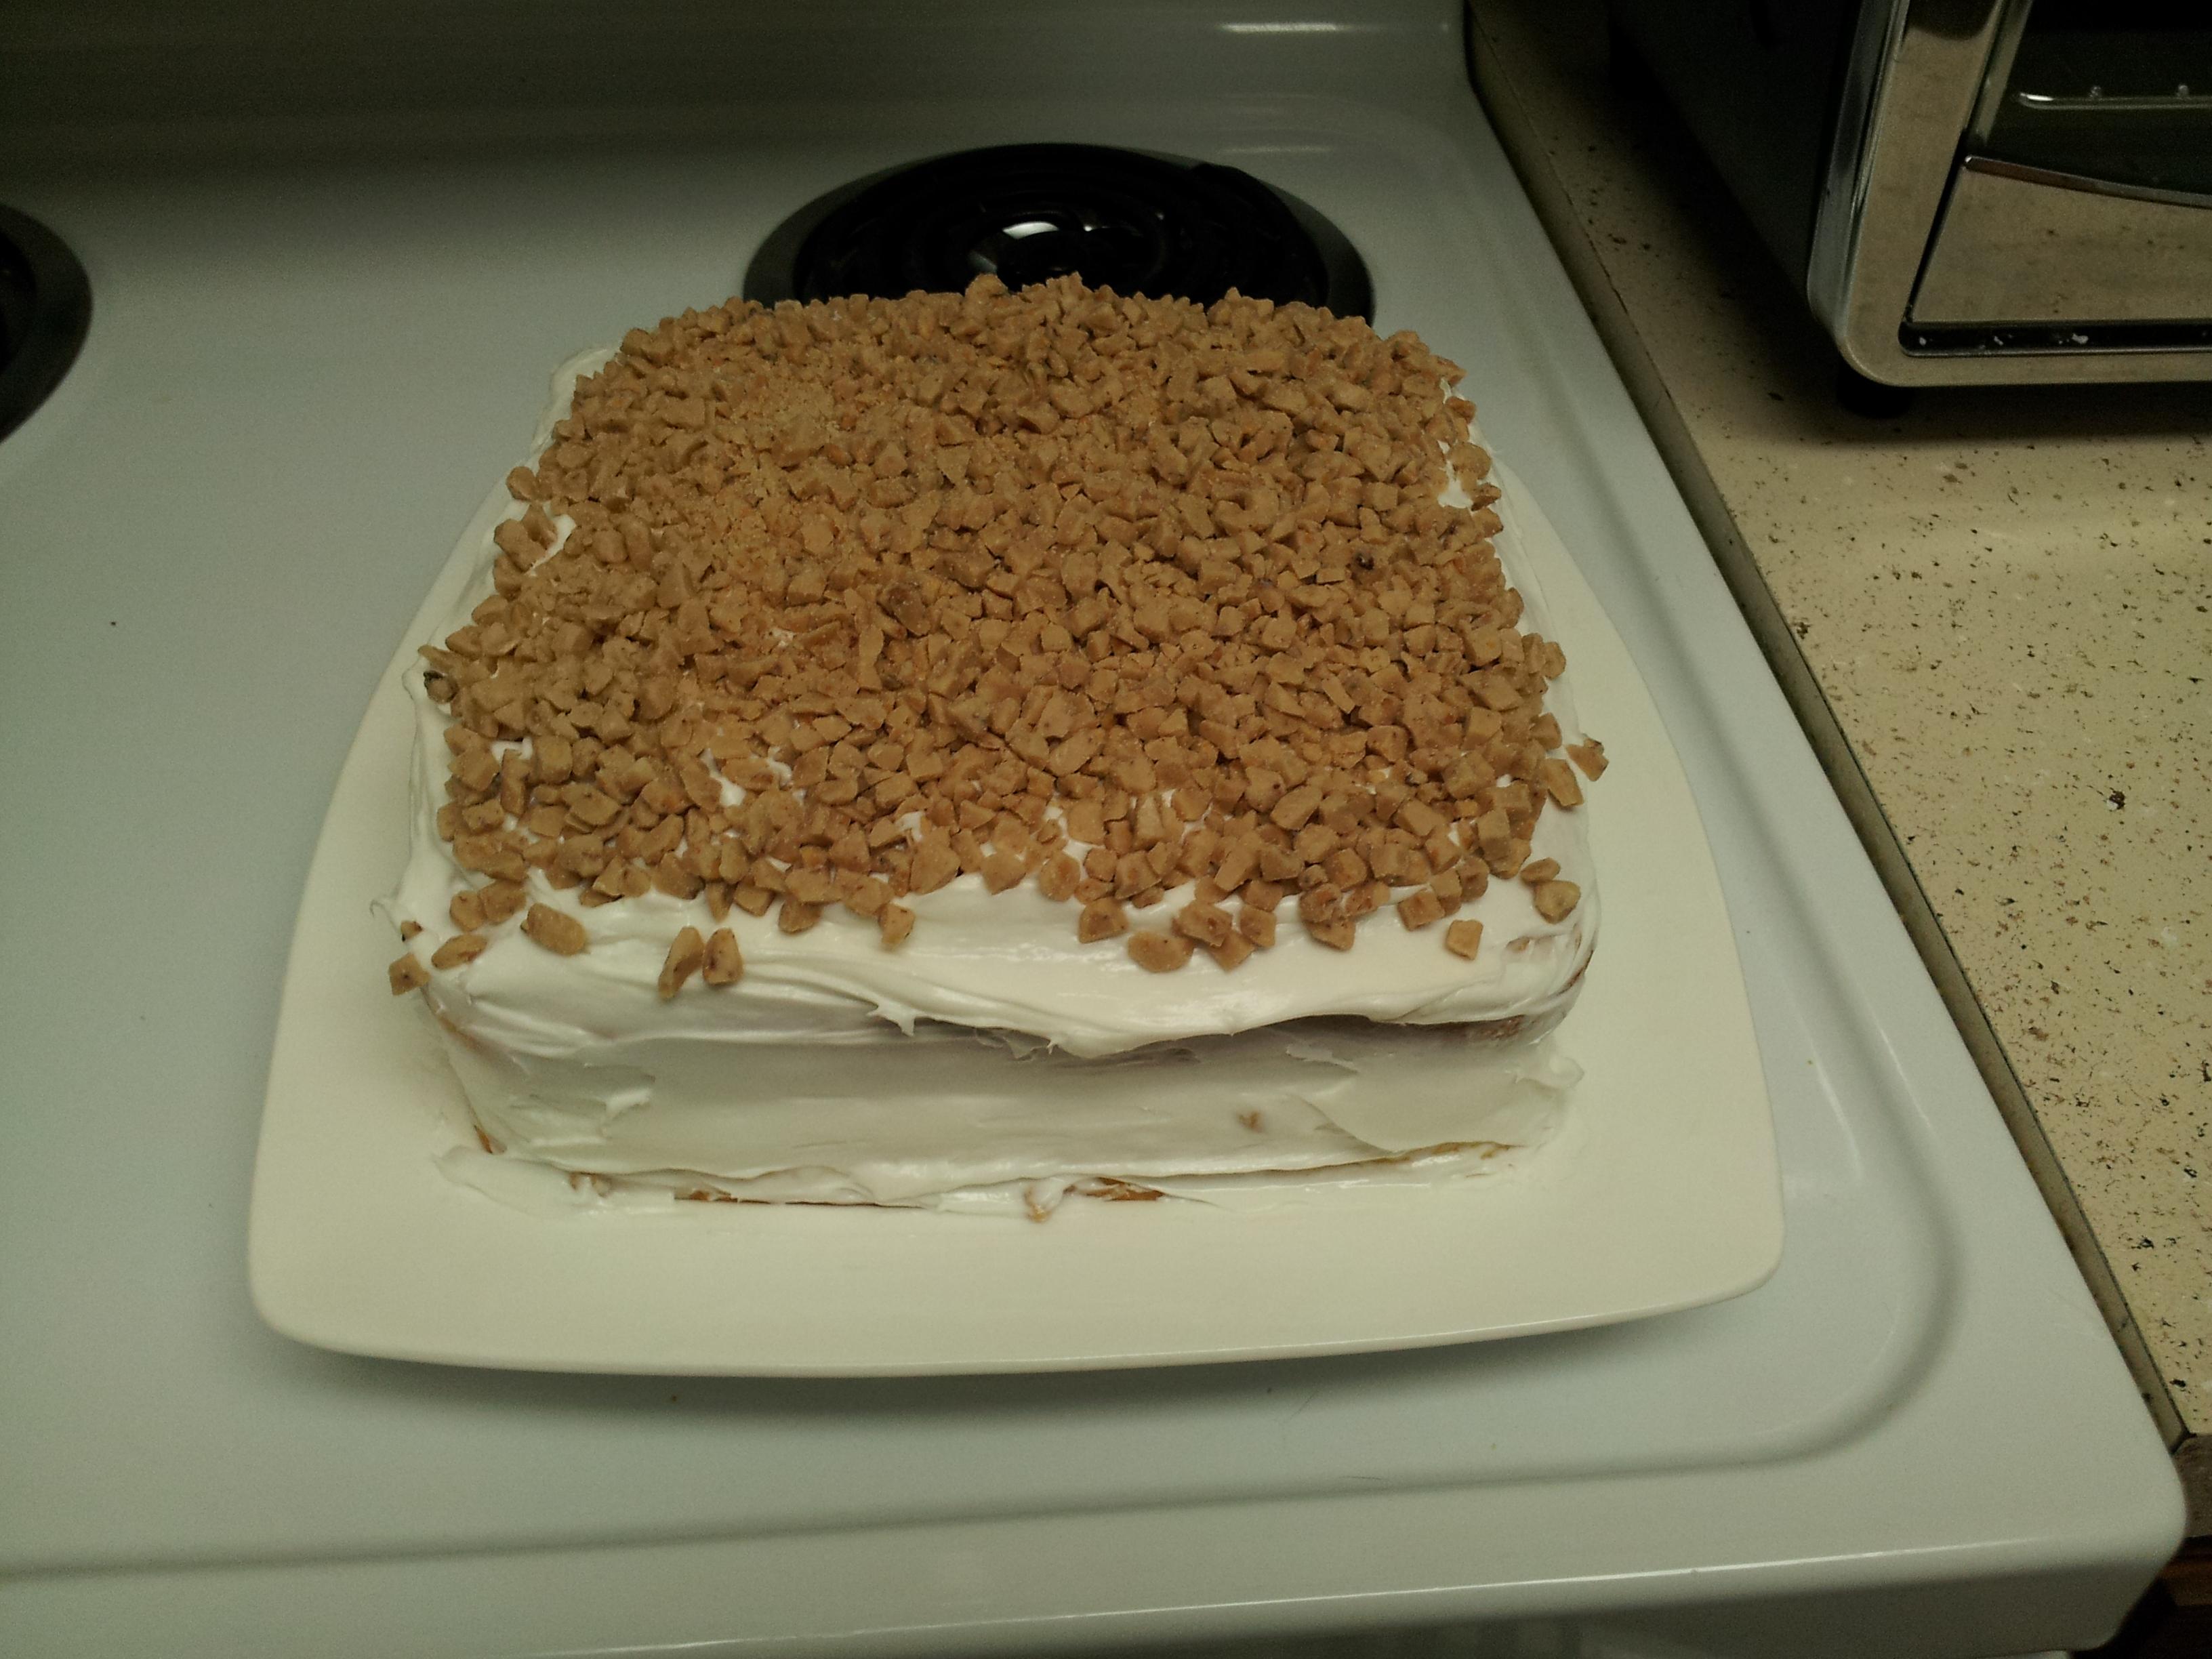 Baking My Own Cake The Feminist Menagerie